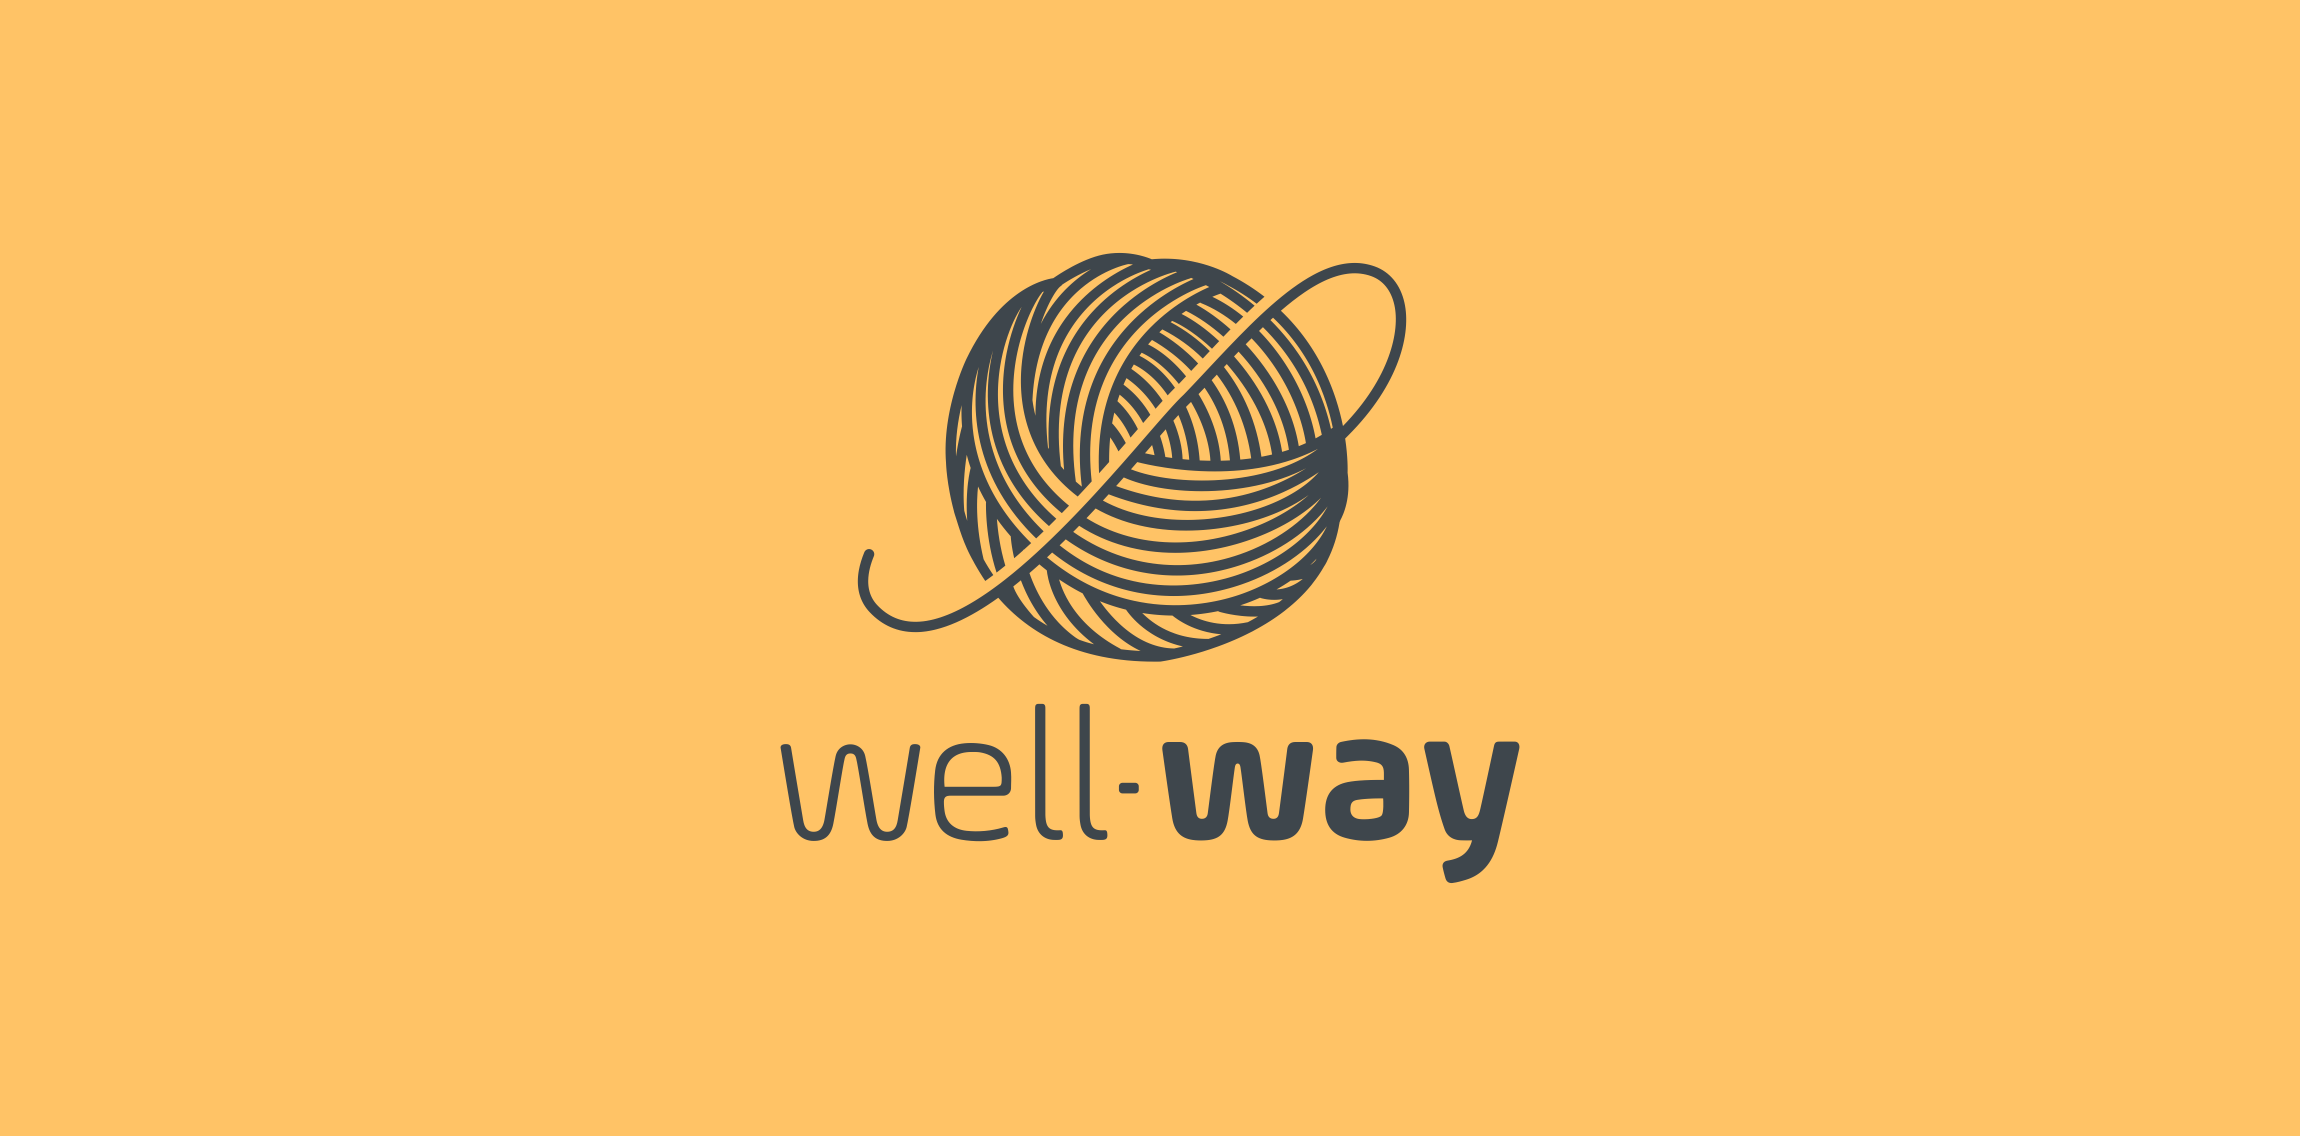 Well-way